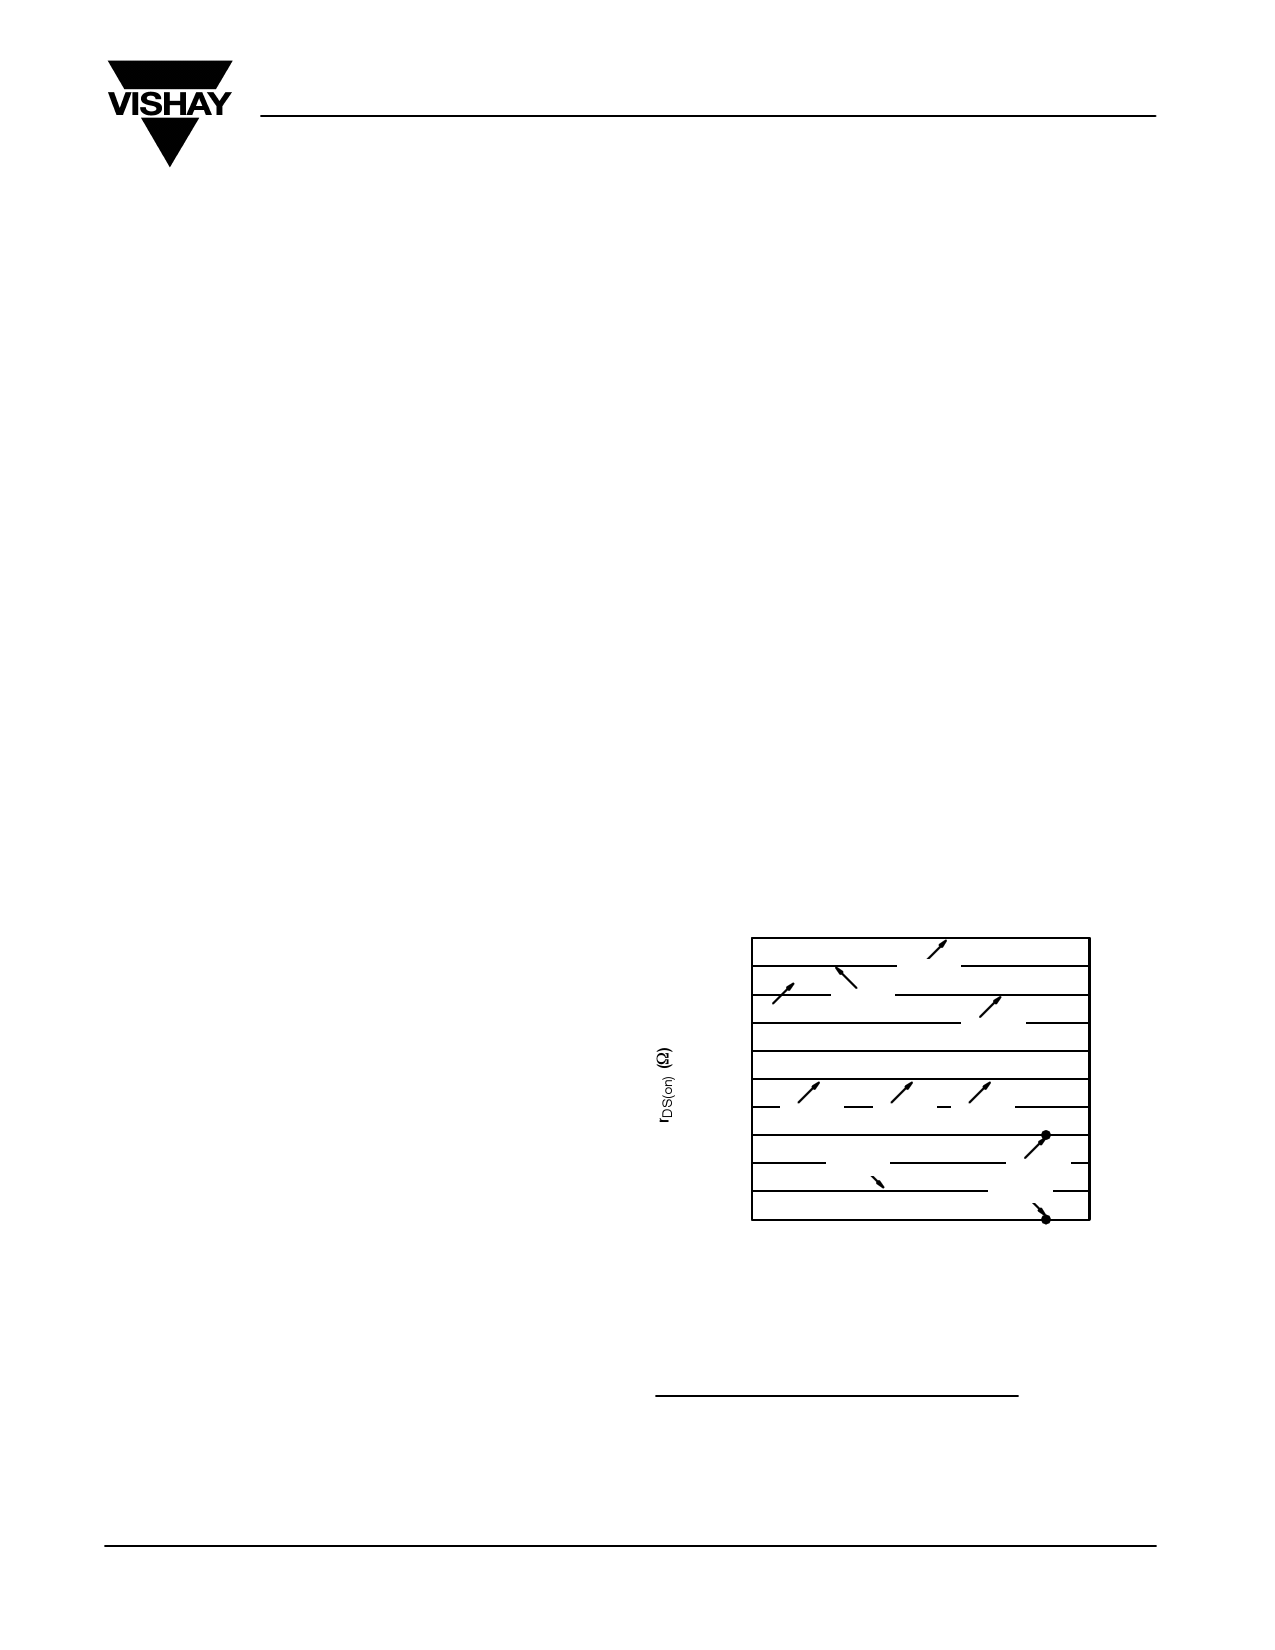 AN605 datasheet, circuit